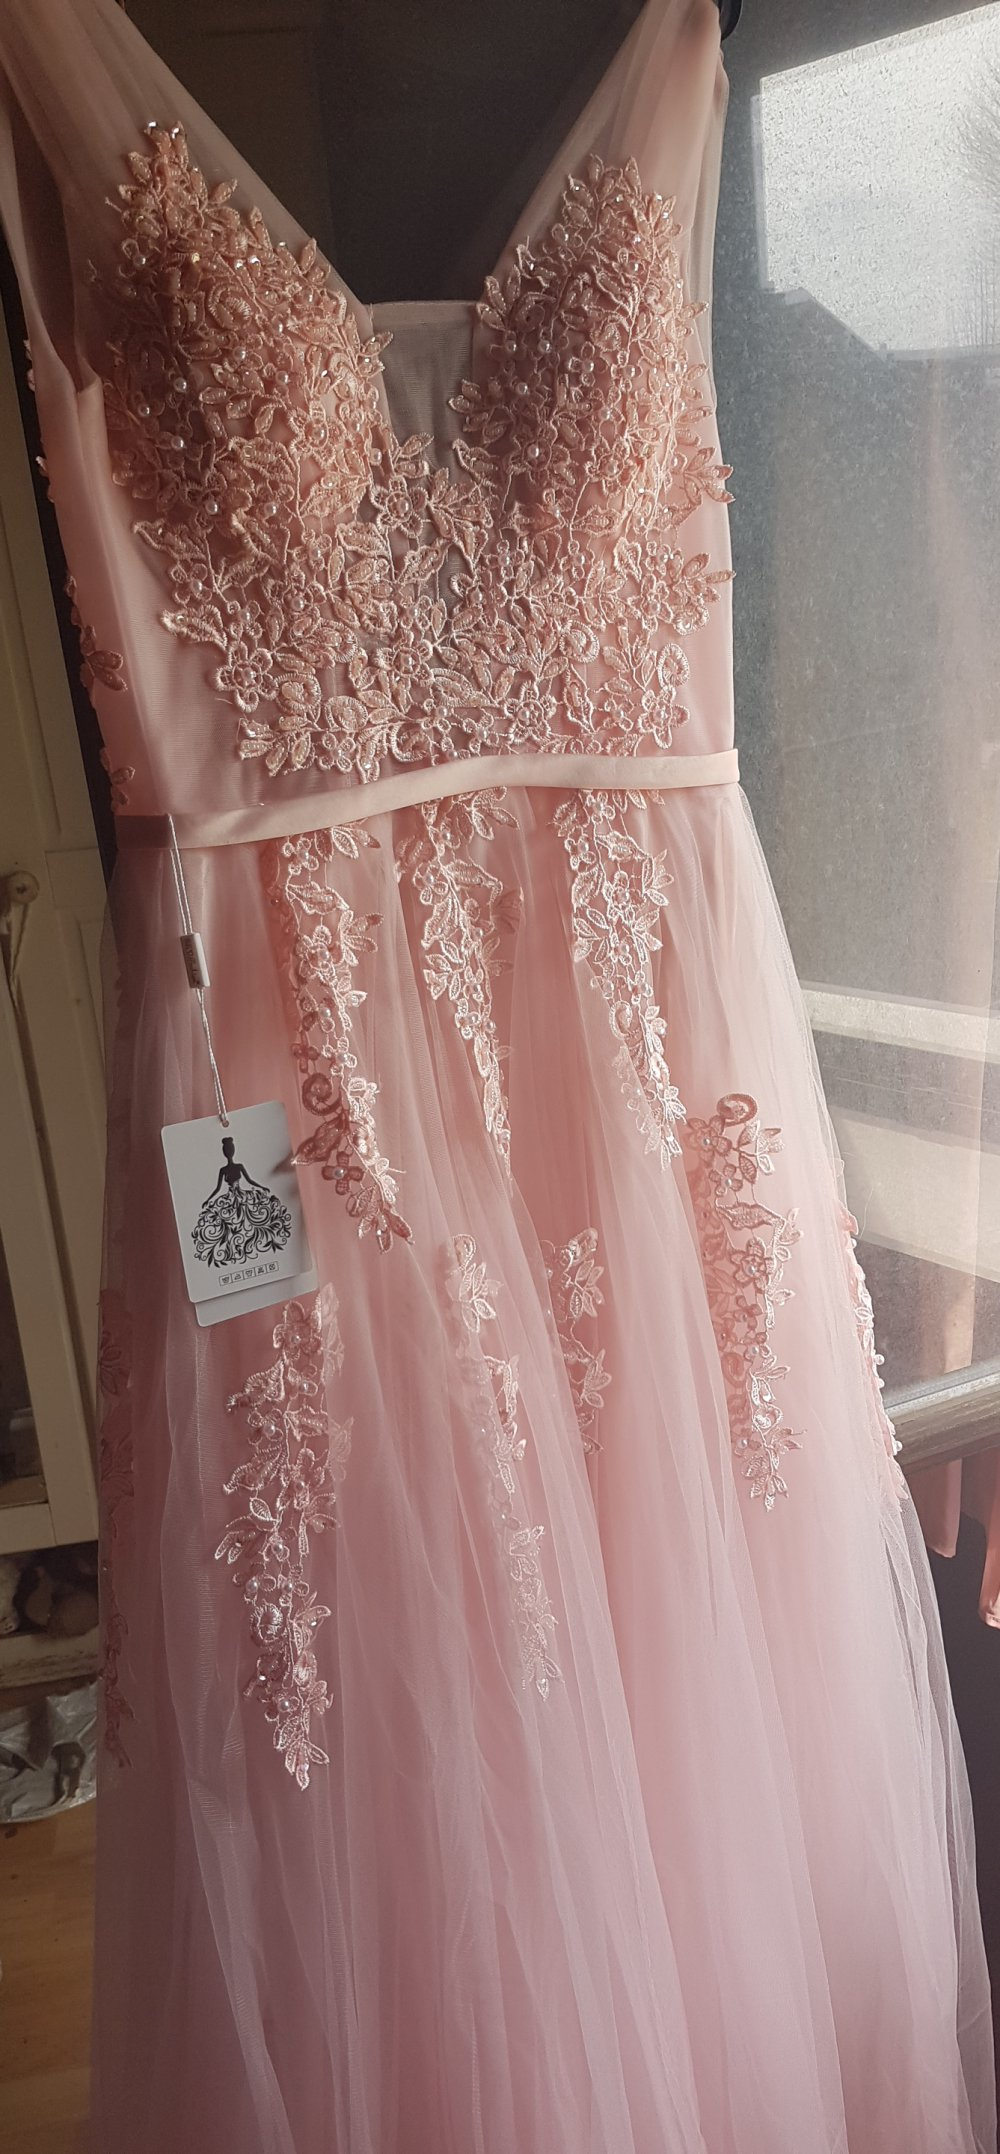 No Name Abendkleid Abikleid Cocktailkleid Sommer Kleid Kleiderkorb De